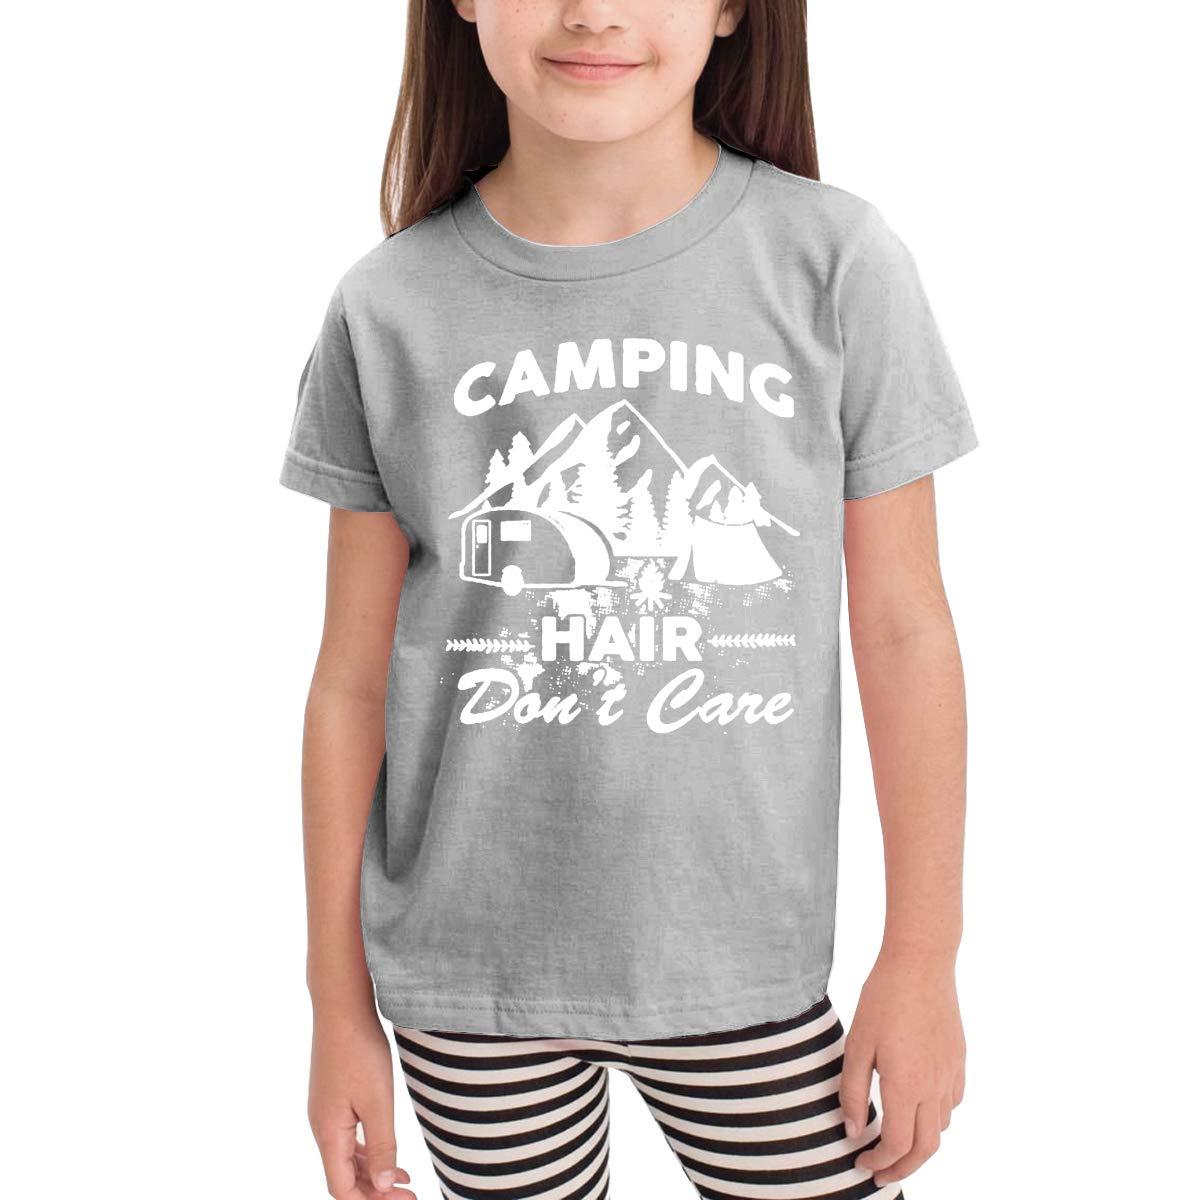 Camping Hair Dont Care Unisex Youths Short Sleeve T-Shirt Kids T-Shirt Tops Black